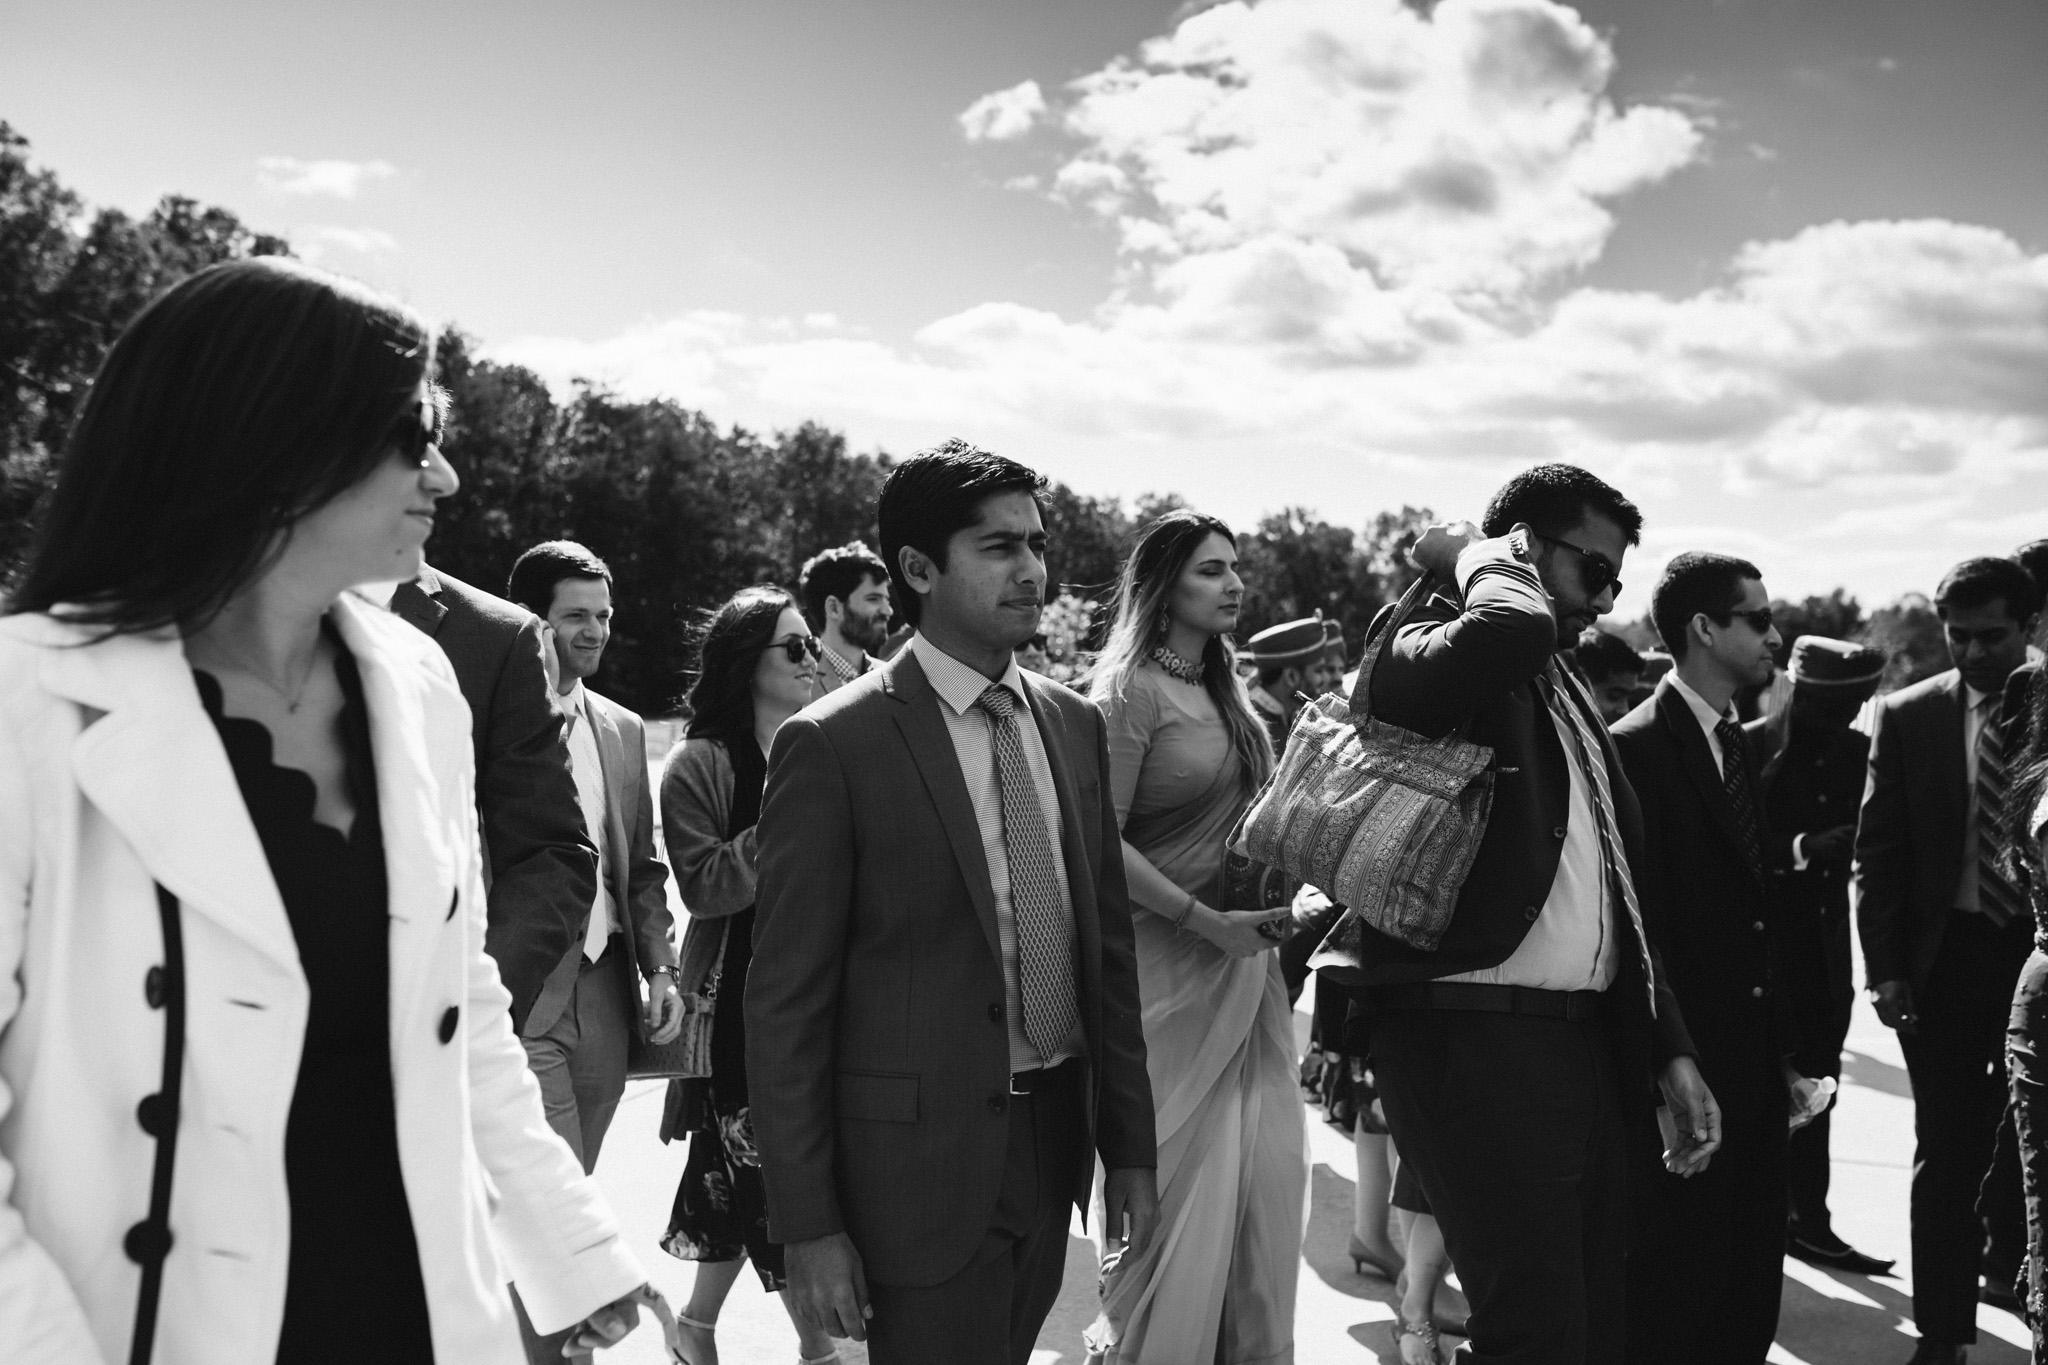 rebeccaburtphotography.hindiwedding.moraisvineyards.virginiawedding-71.JPG